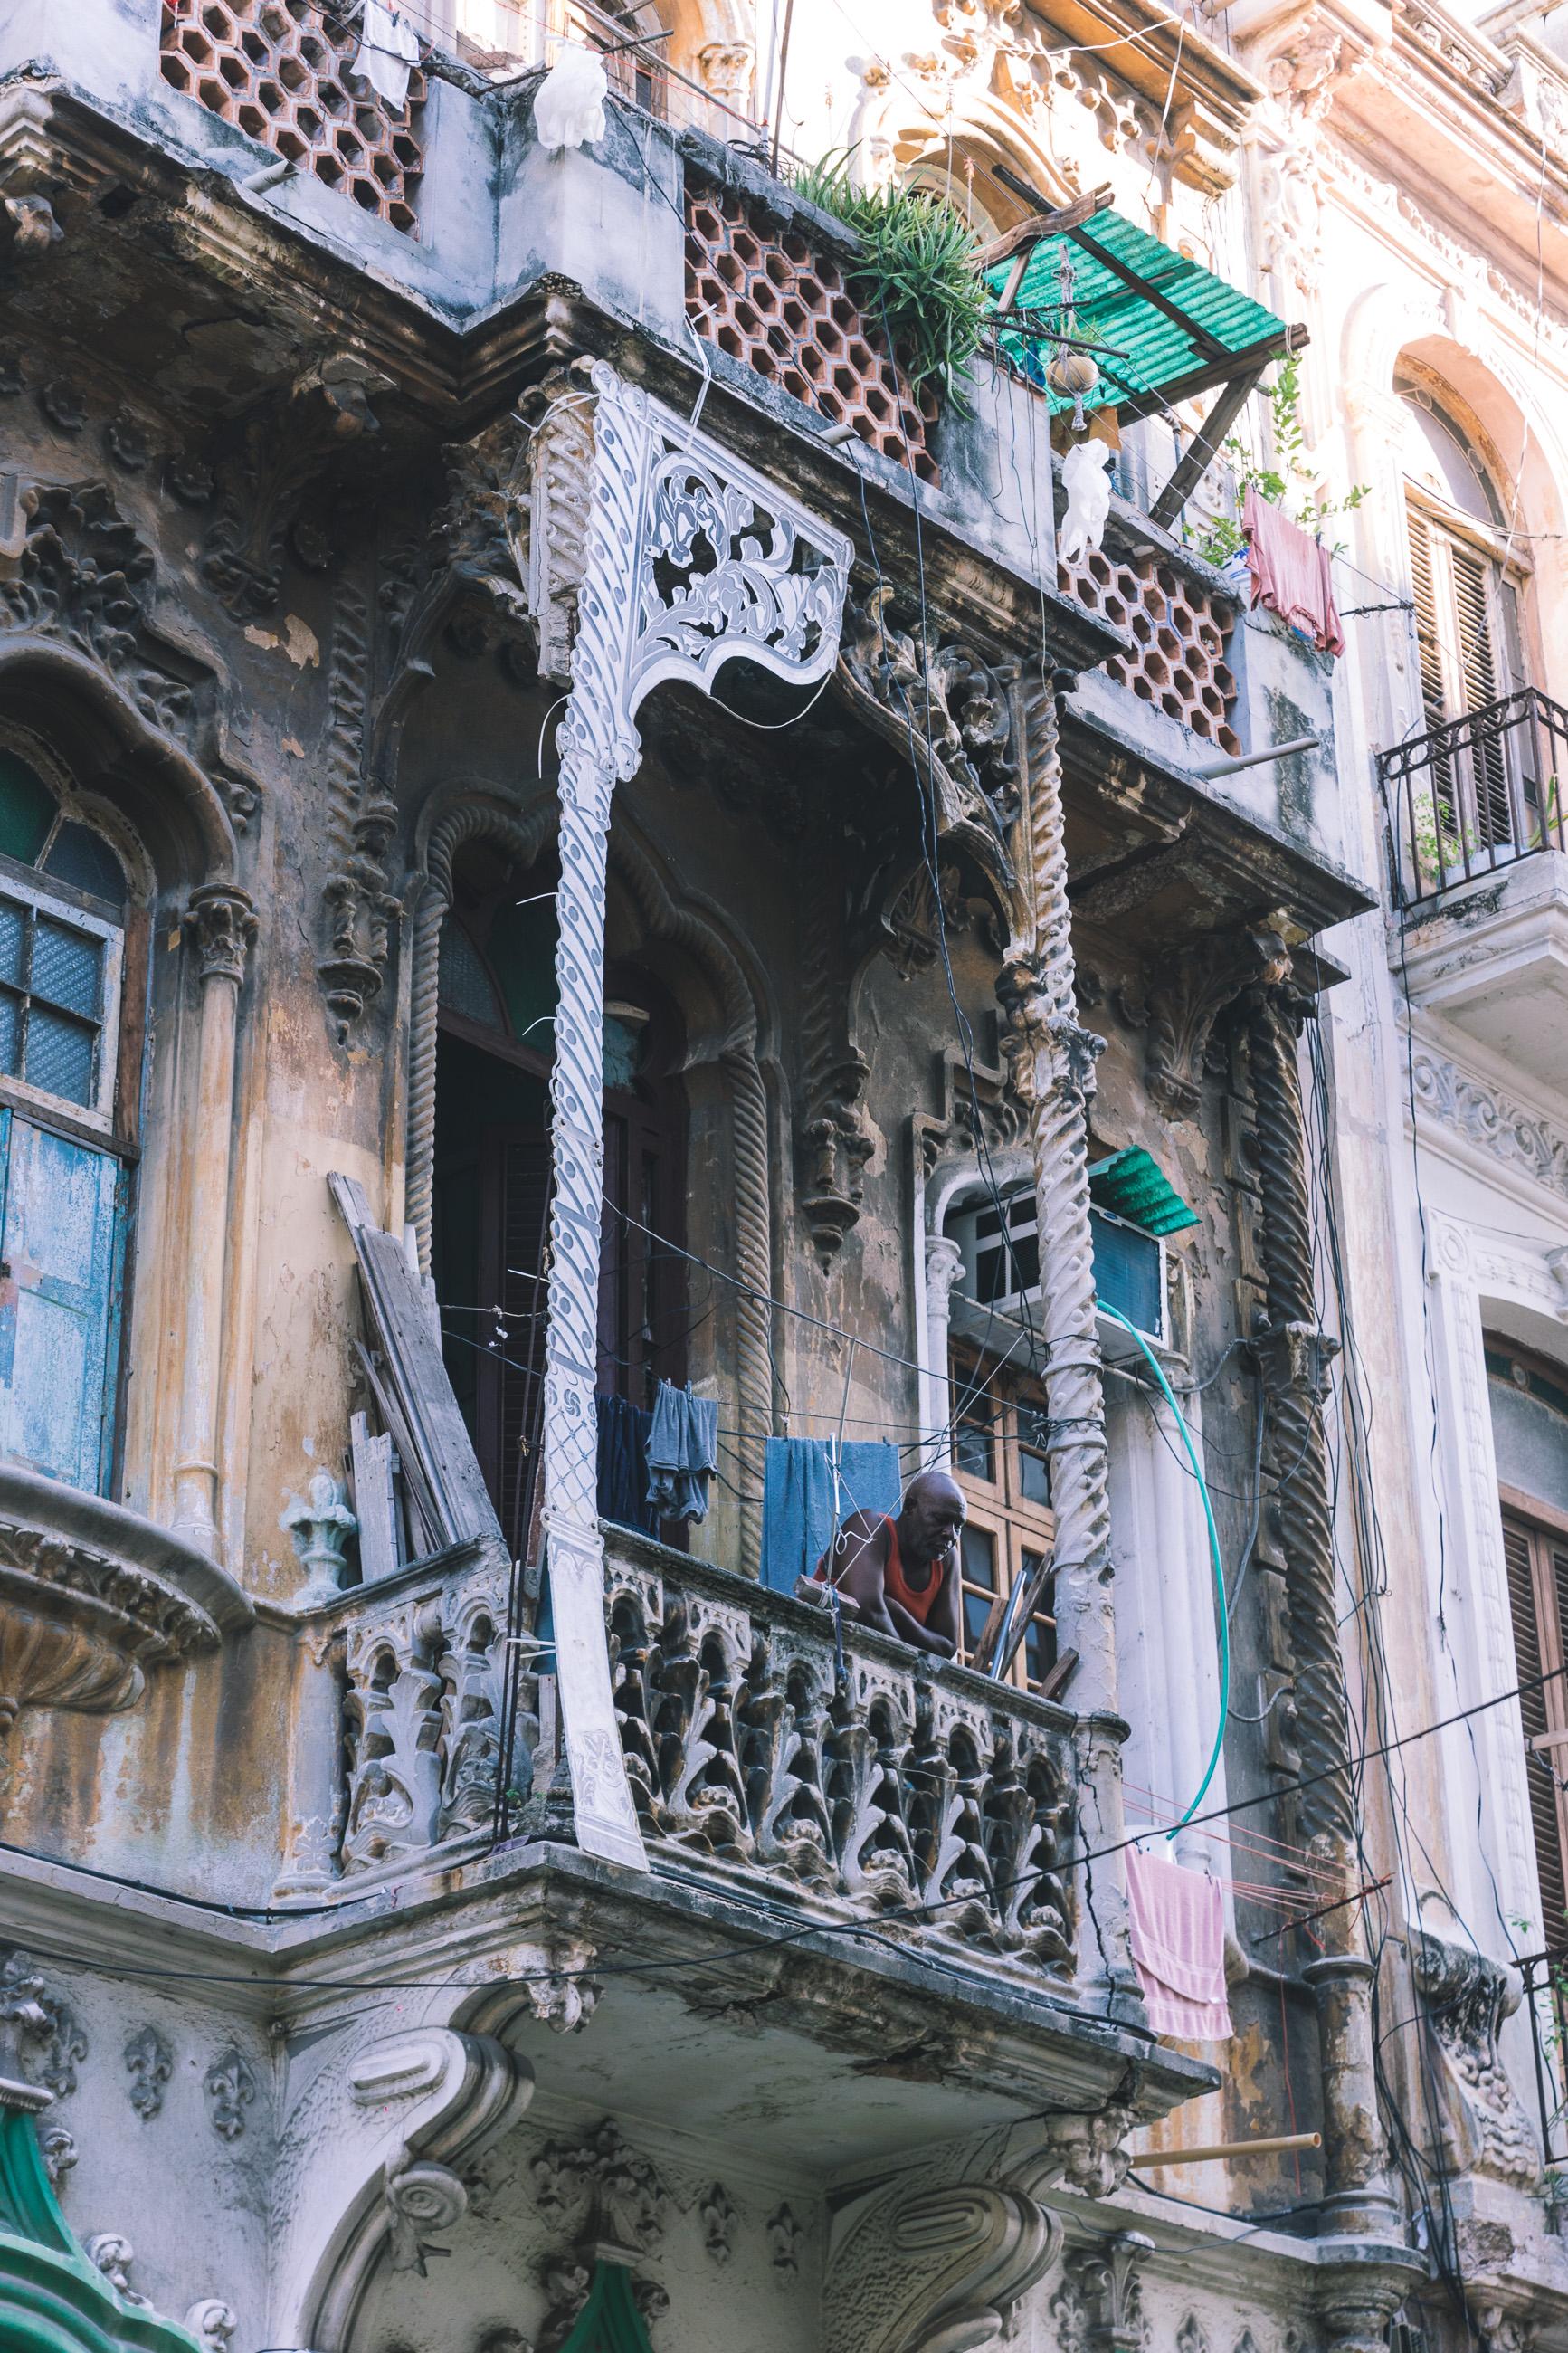 DeClaro-Photography-Cuba-02789.jpg